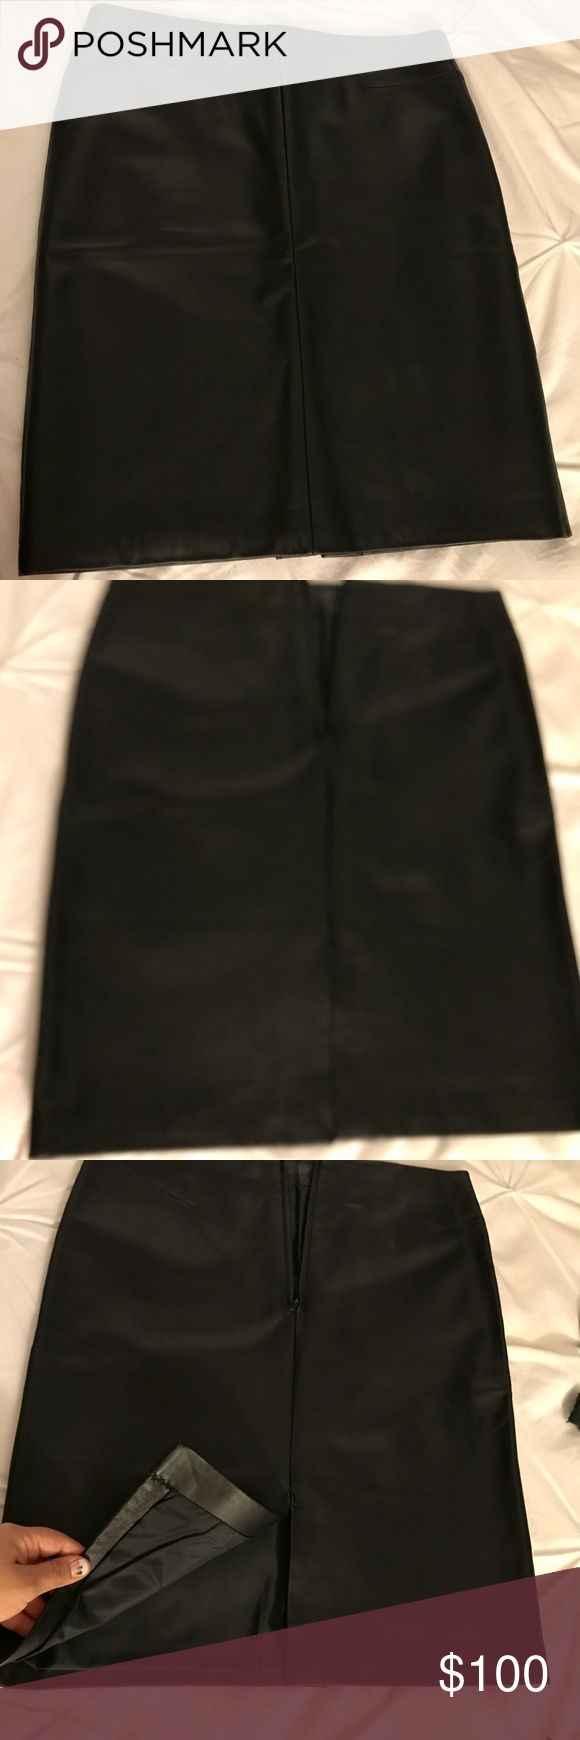 Andrea Viccaro 💯 Genuine Leather Skirt Andrea Viccaro 💯 Genuine Leather skirt. Worn once. Great condition. Like new Andrea Viccaro Skirts